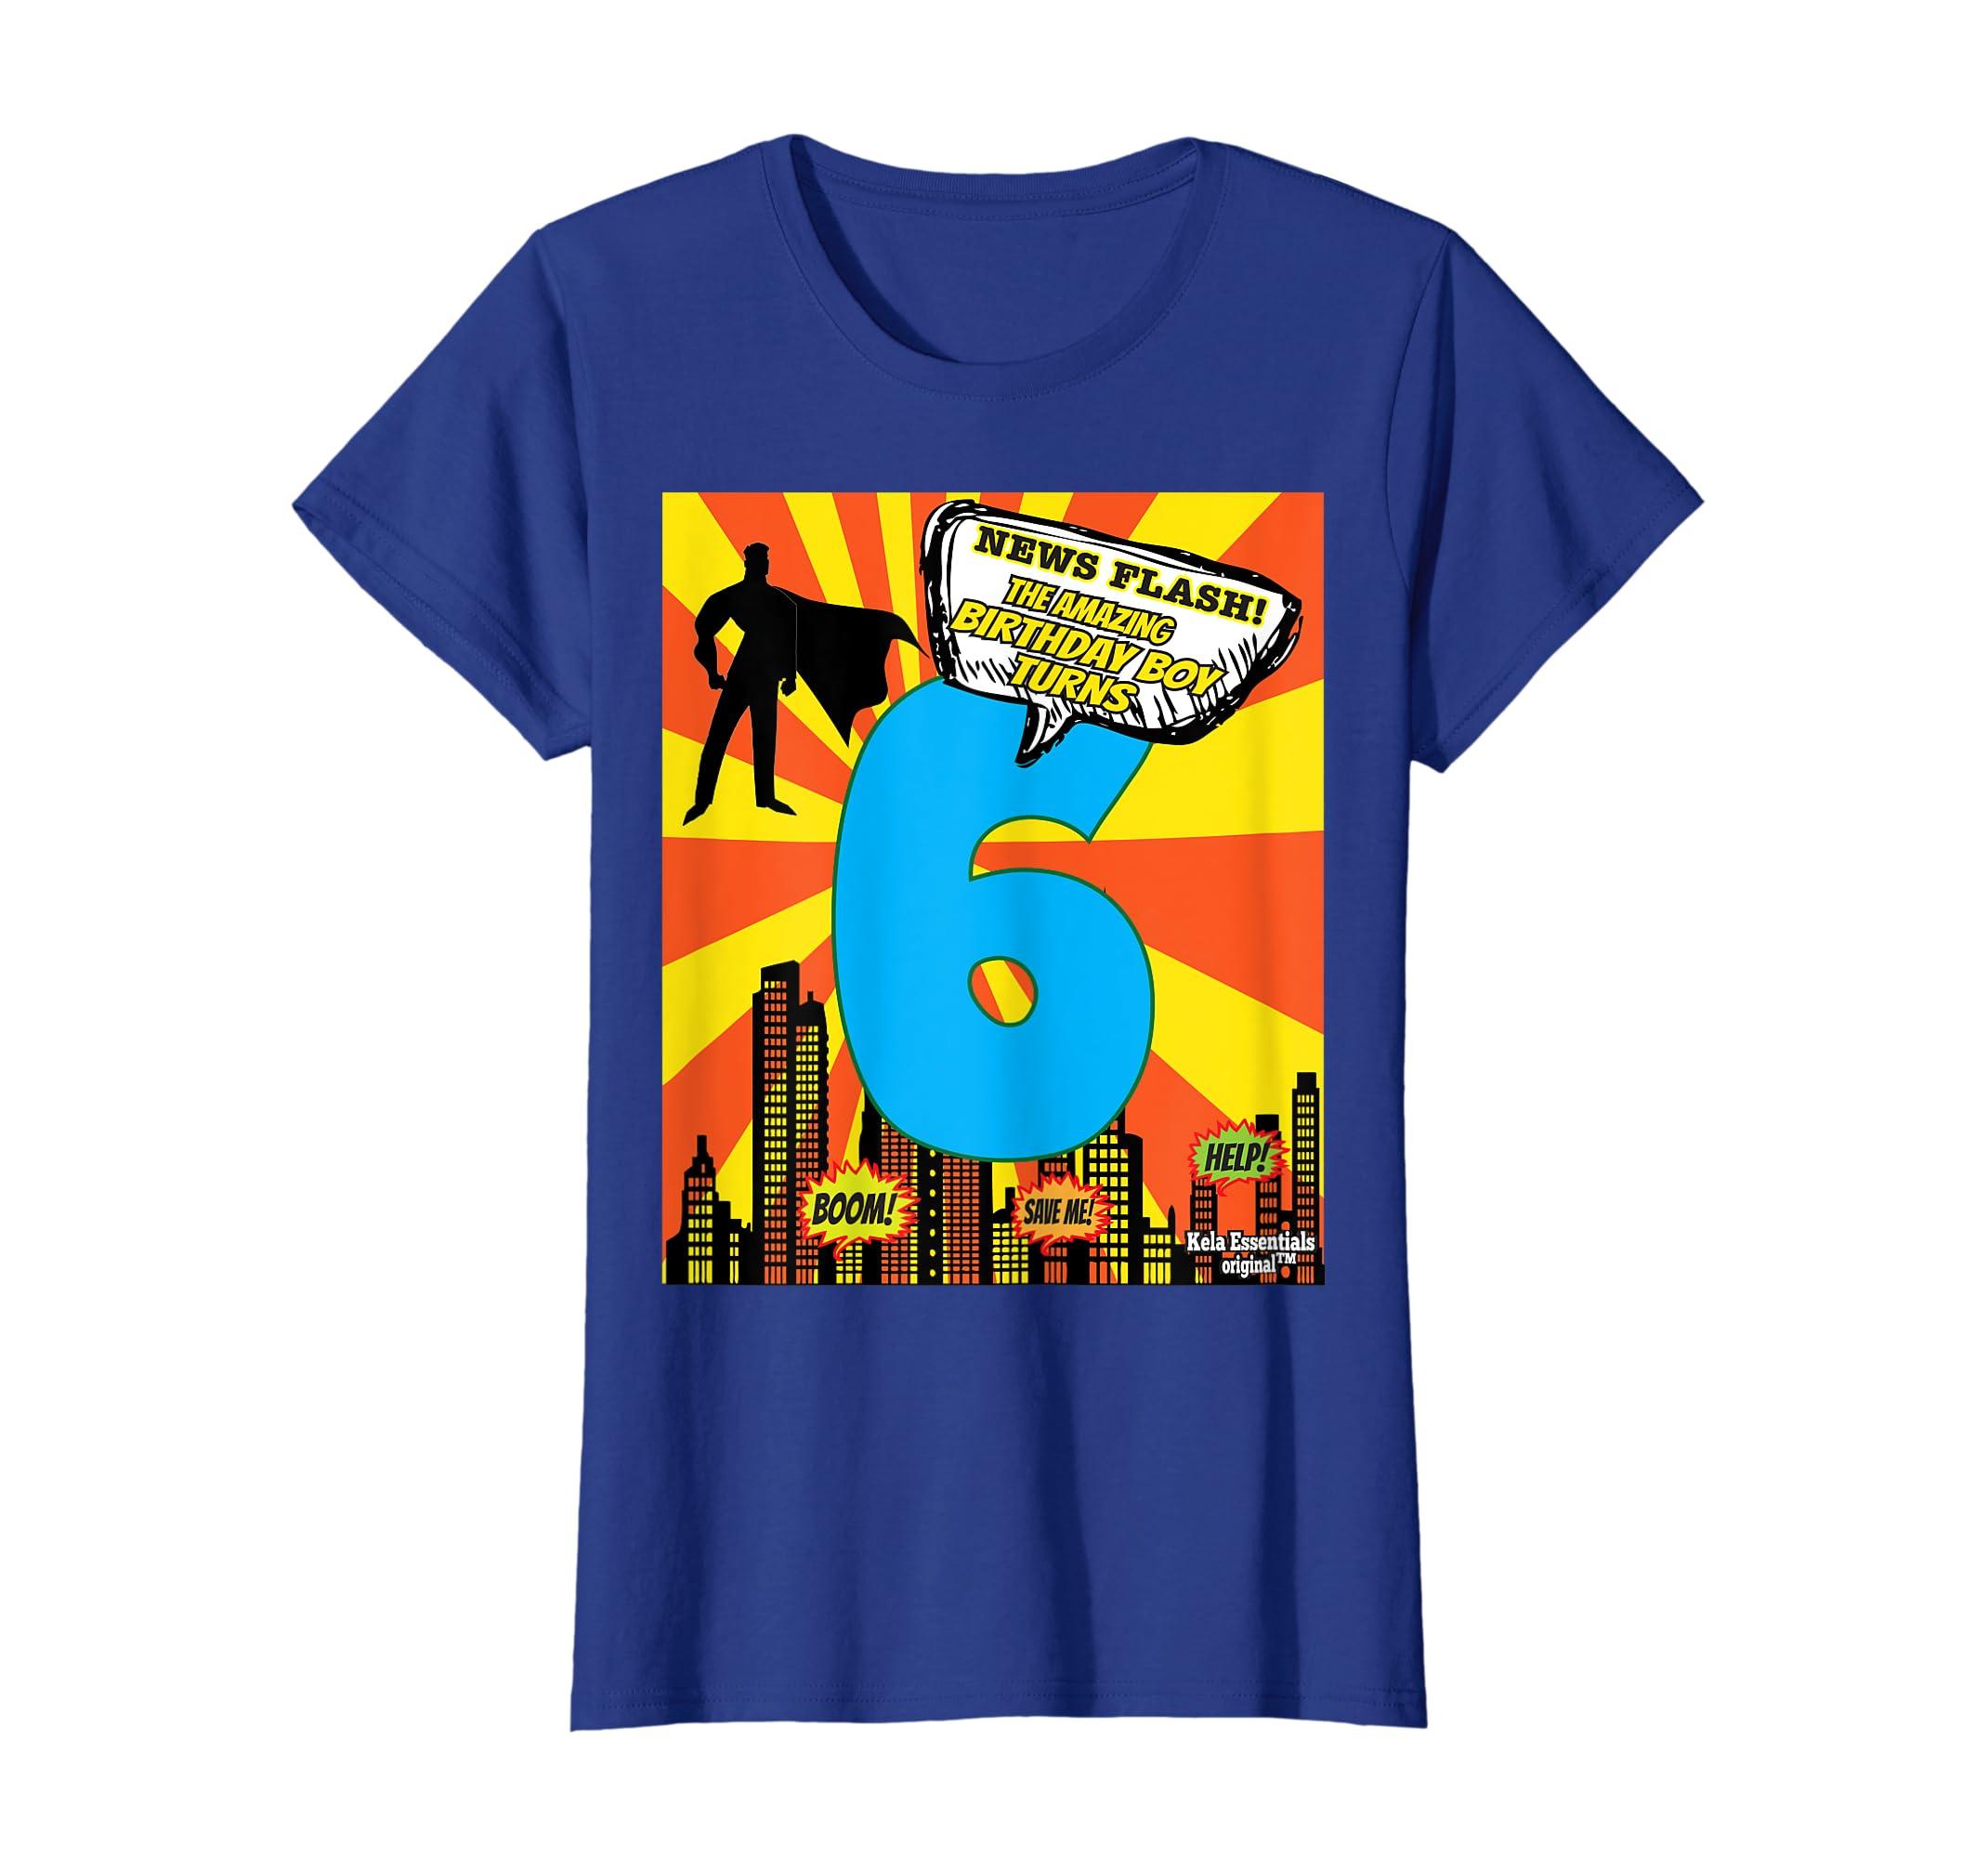 Amazon Superhero Birthday Shirts For Boys Size 6 Six Party Theme Clothing